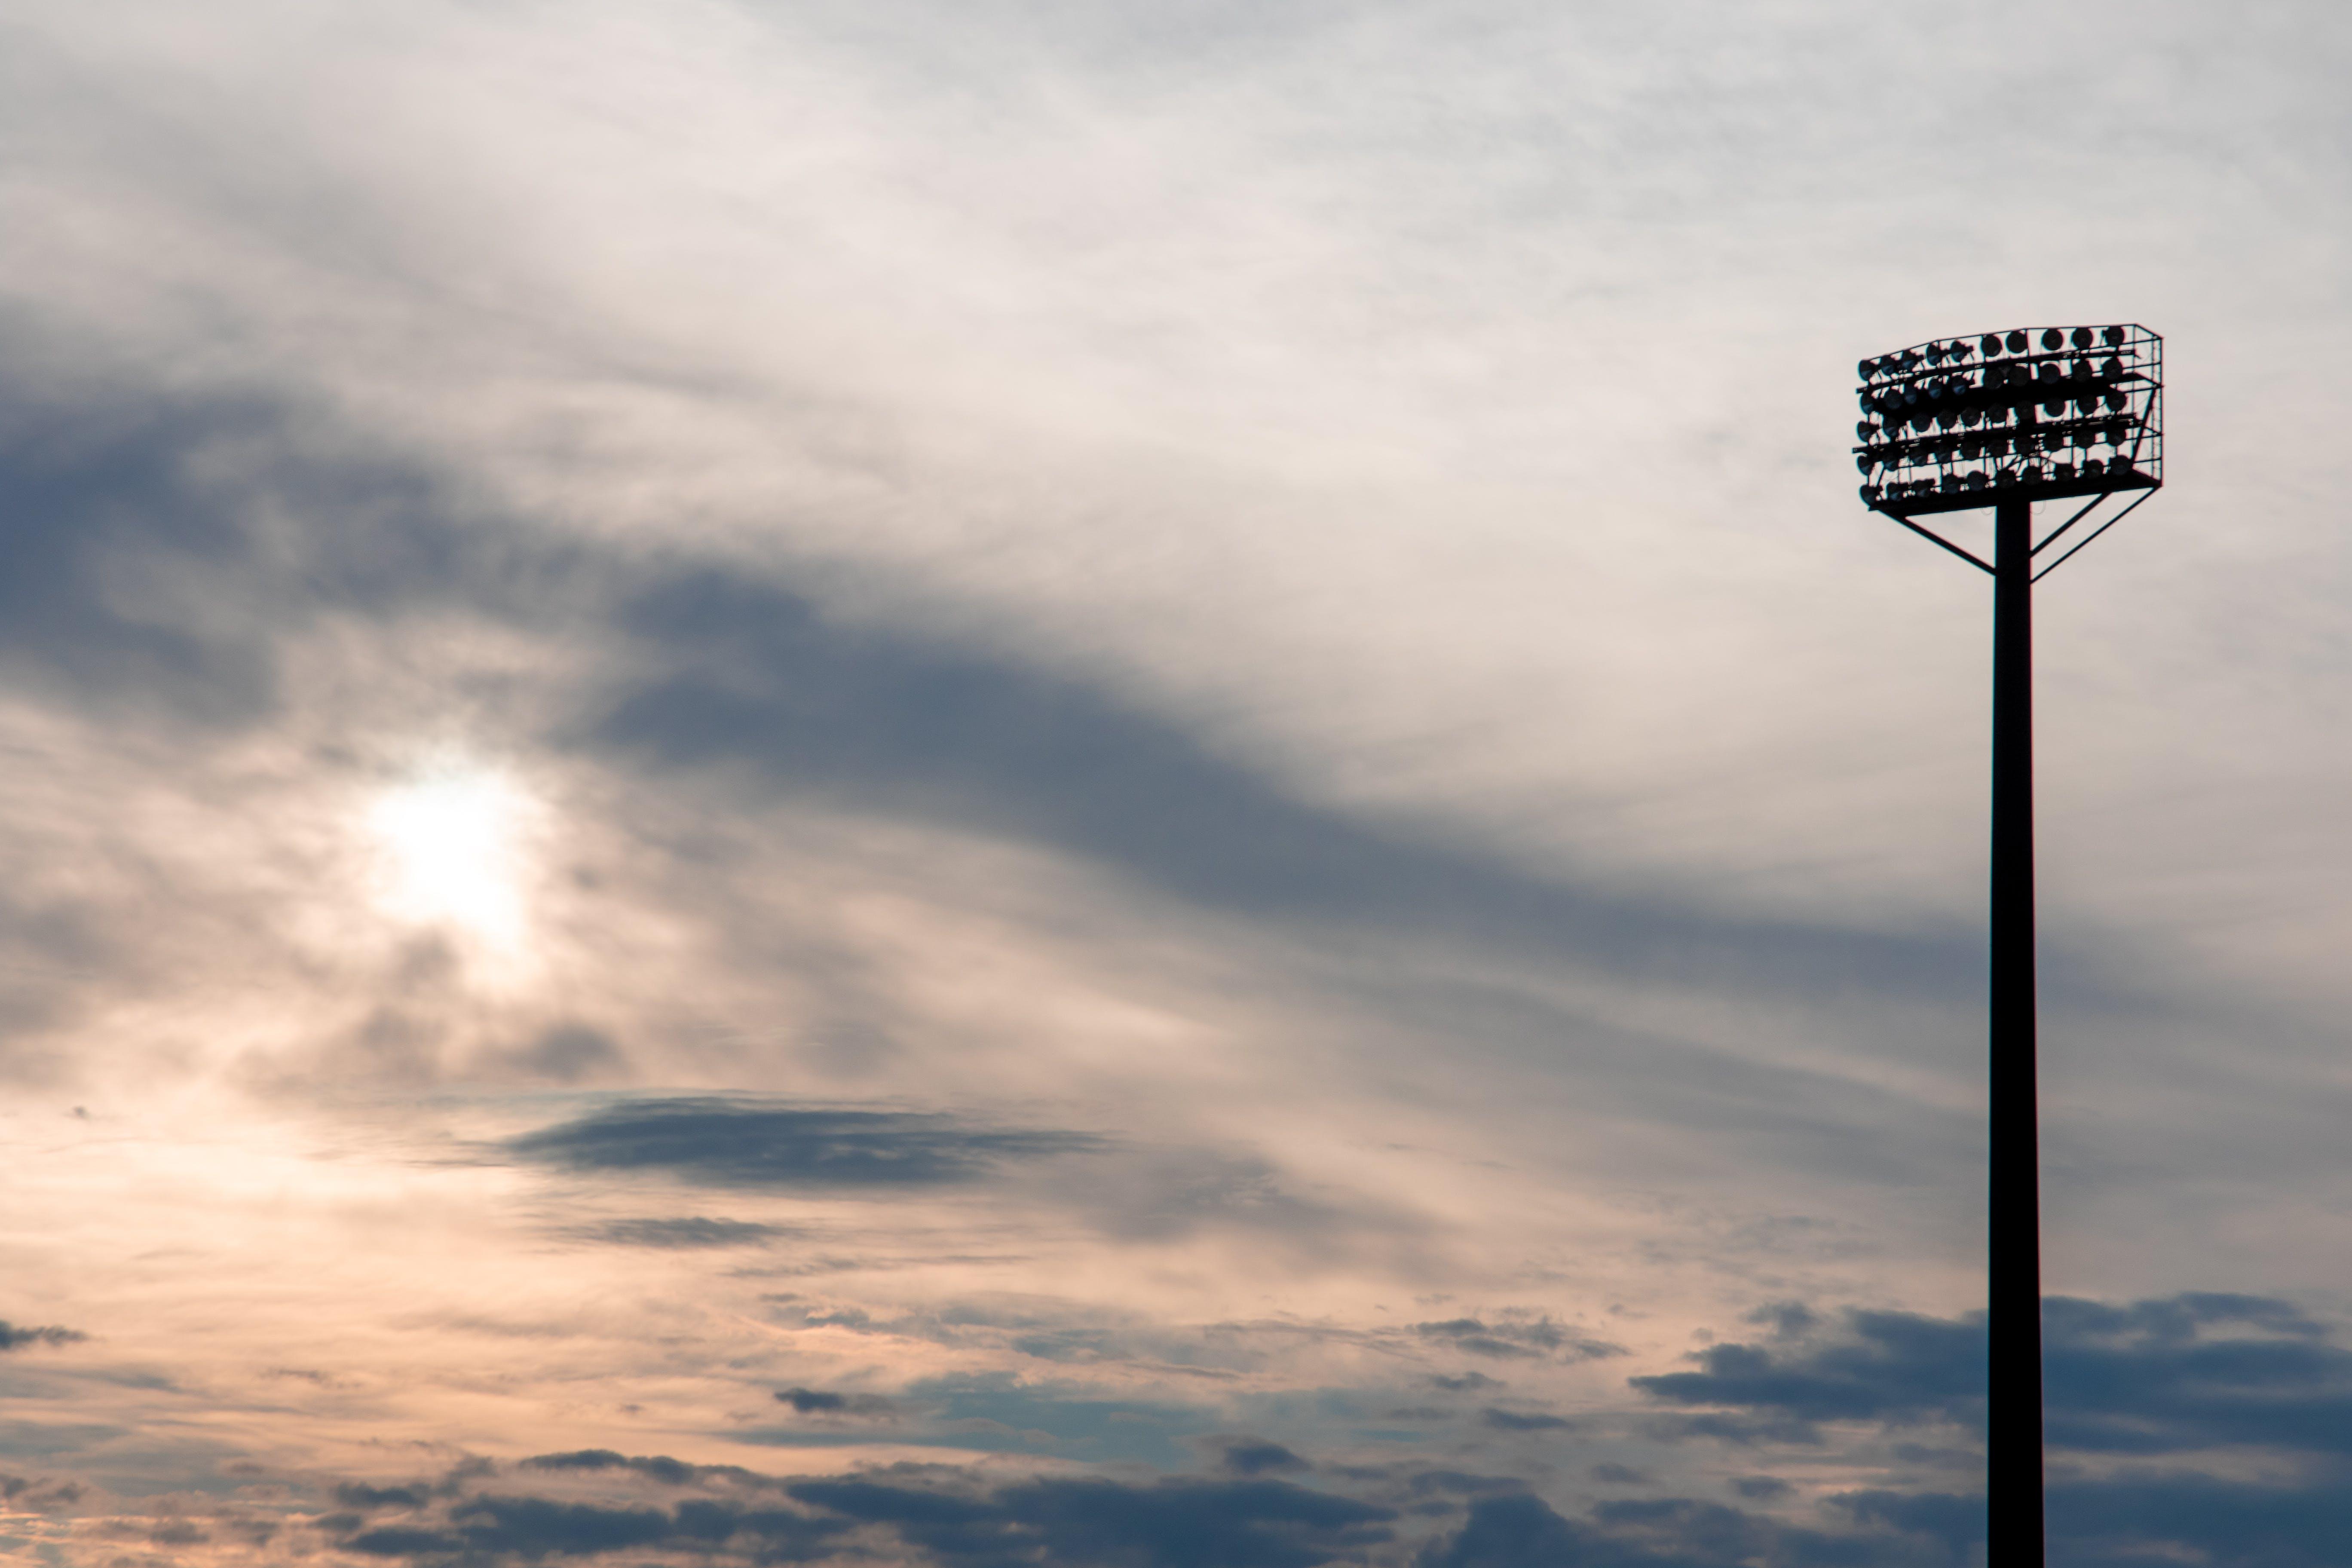 Kostenloses Stock Foto zu beleuchtung, blauer himmel, sonnenaufgang, sport